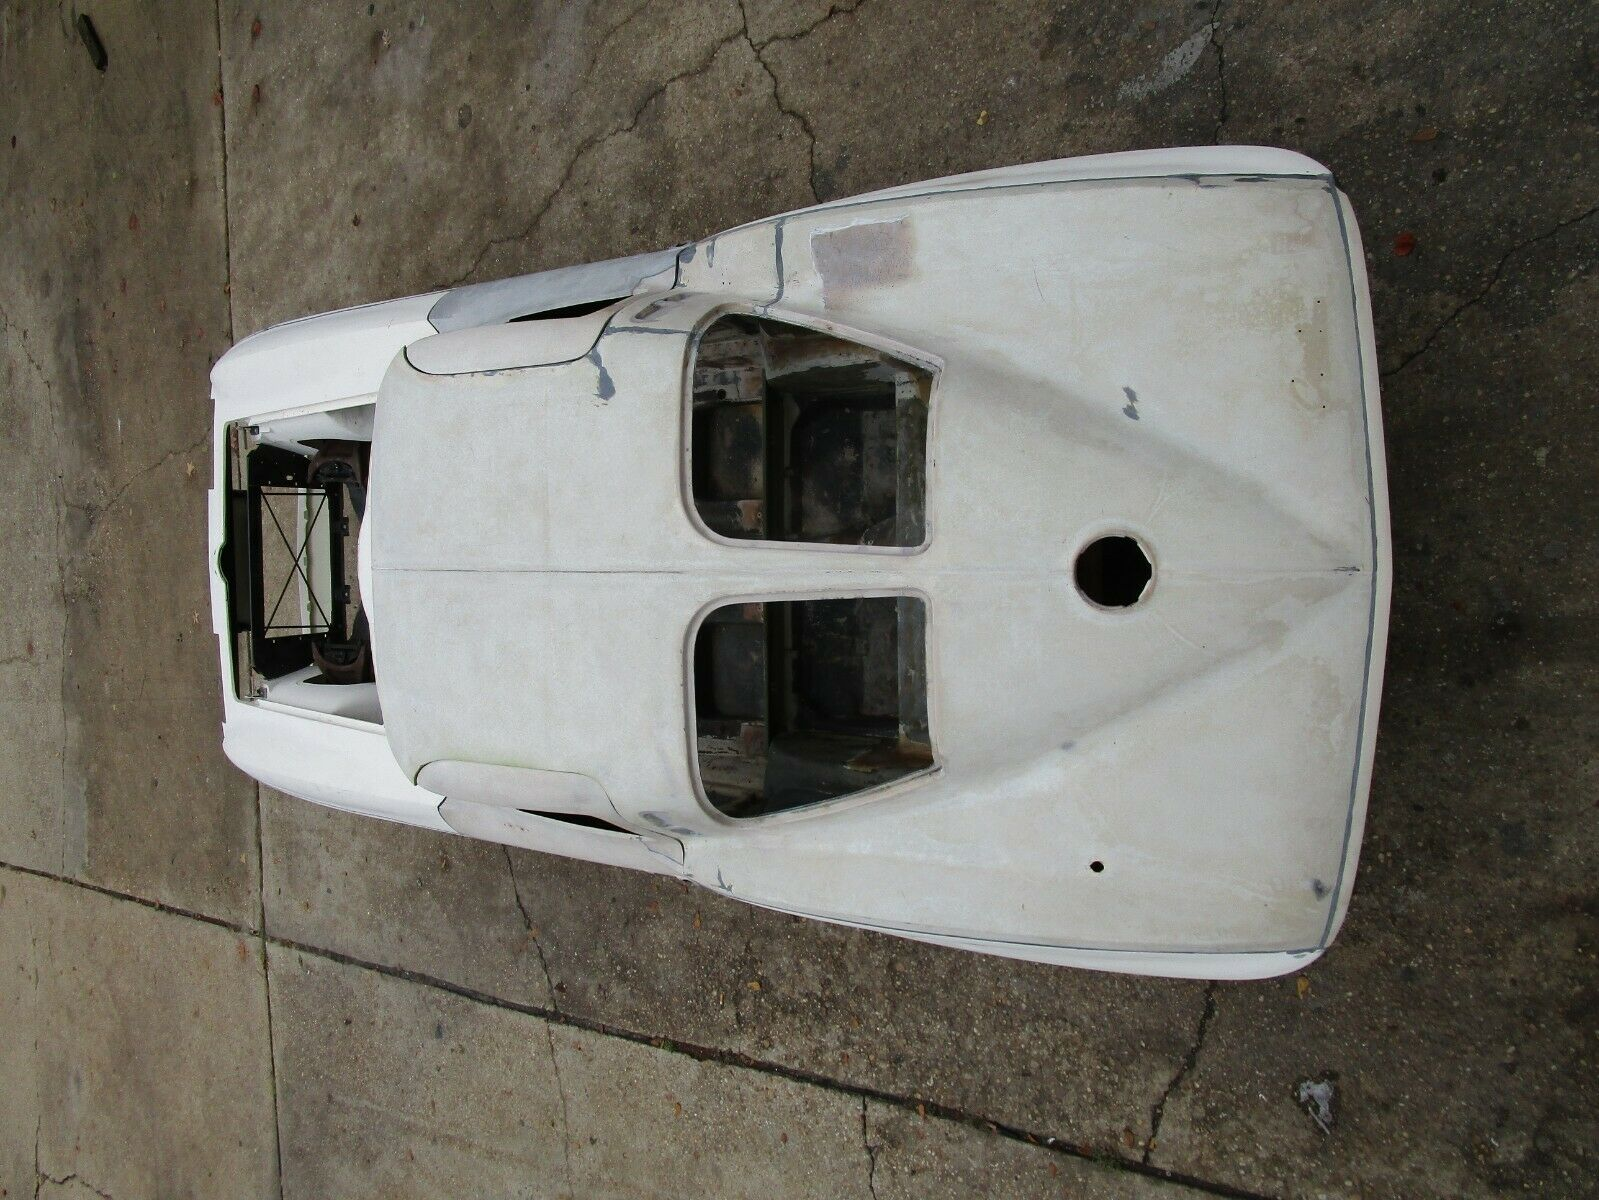 1963 silver blue Chevrolet Corvette Stingray  | C2 Corvette Photo 1